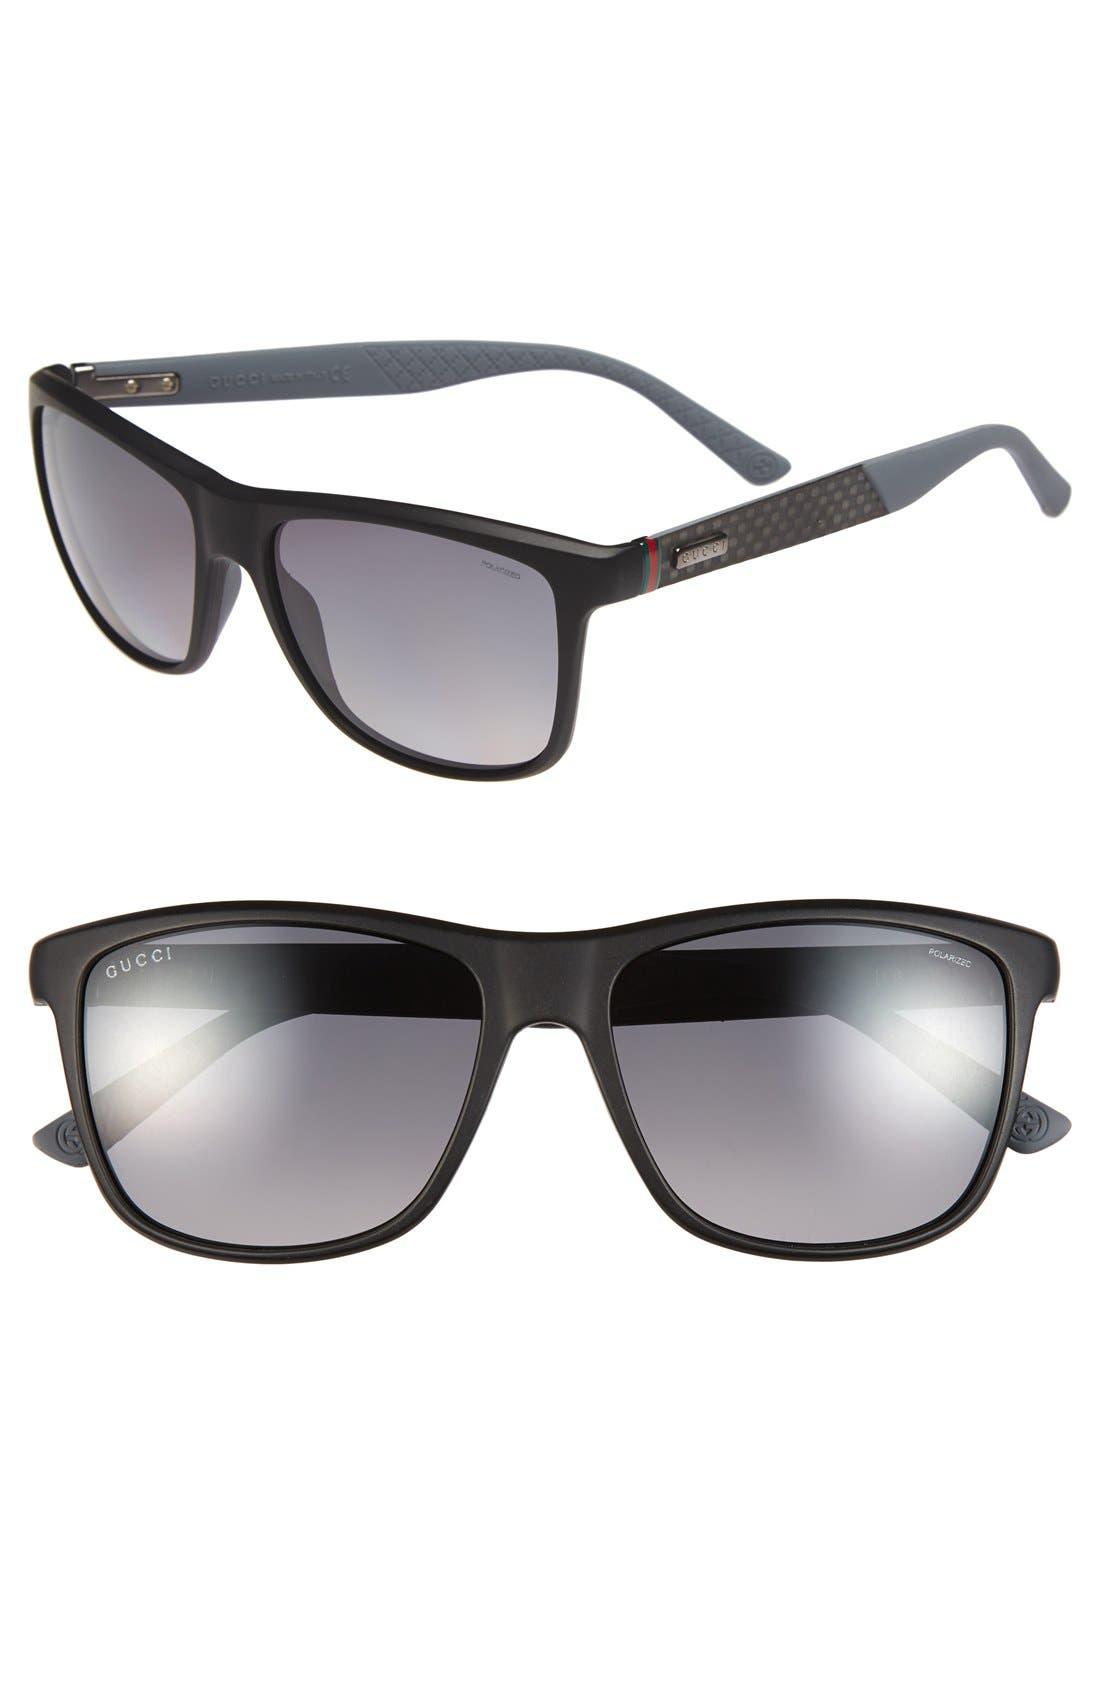 Alternate Image 1 Selected - Gucci 56mm Polarized Retro Sunglasses